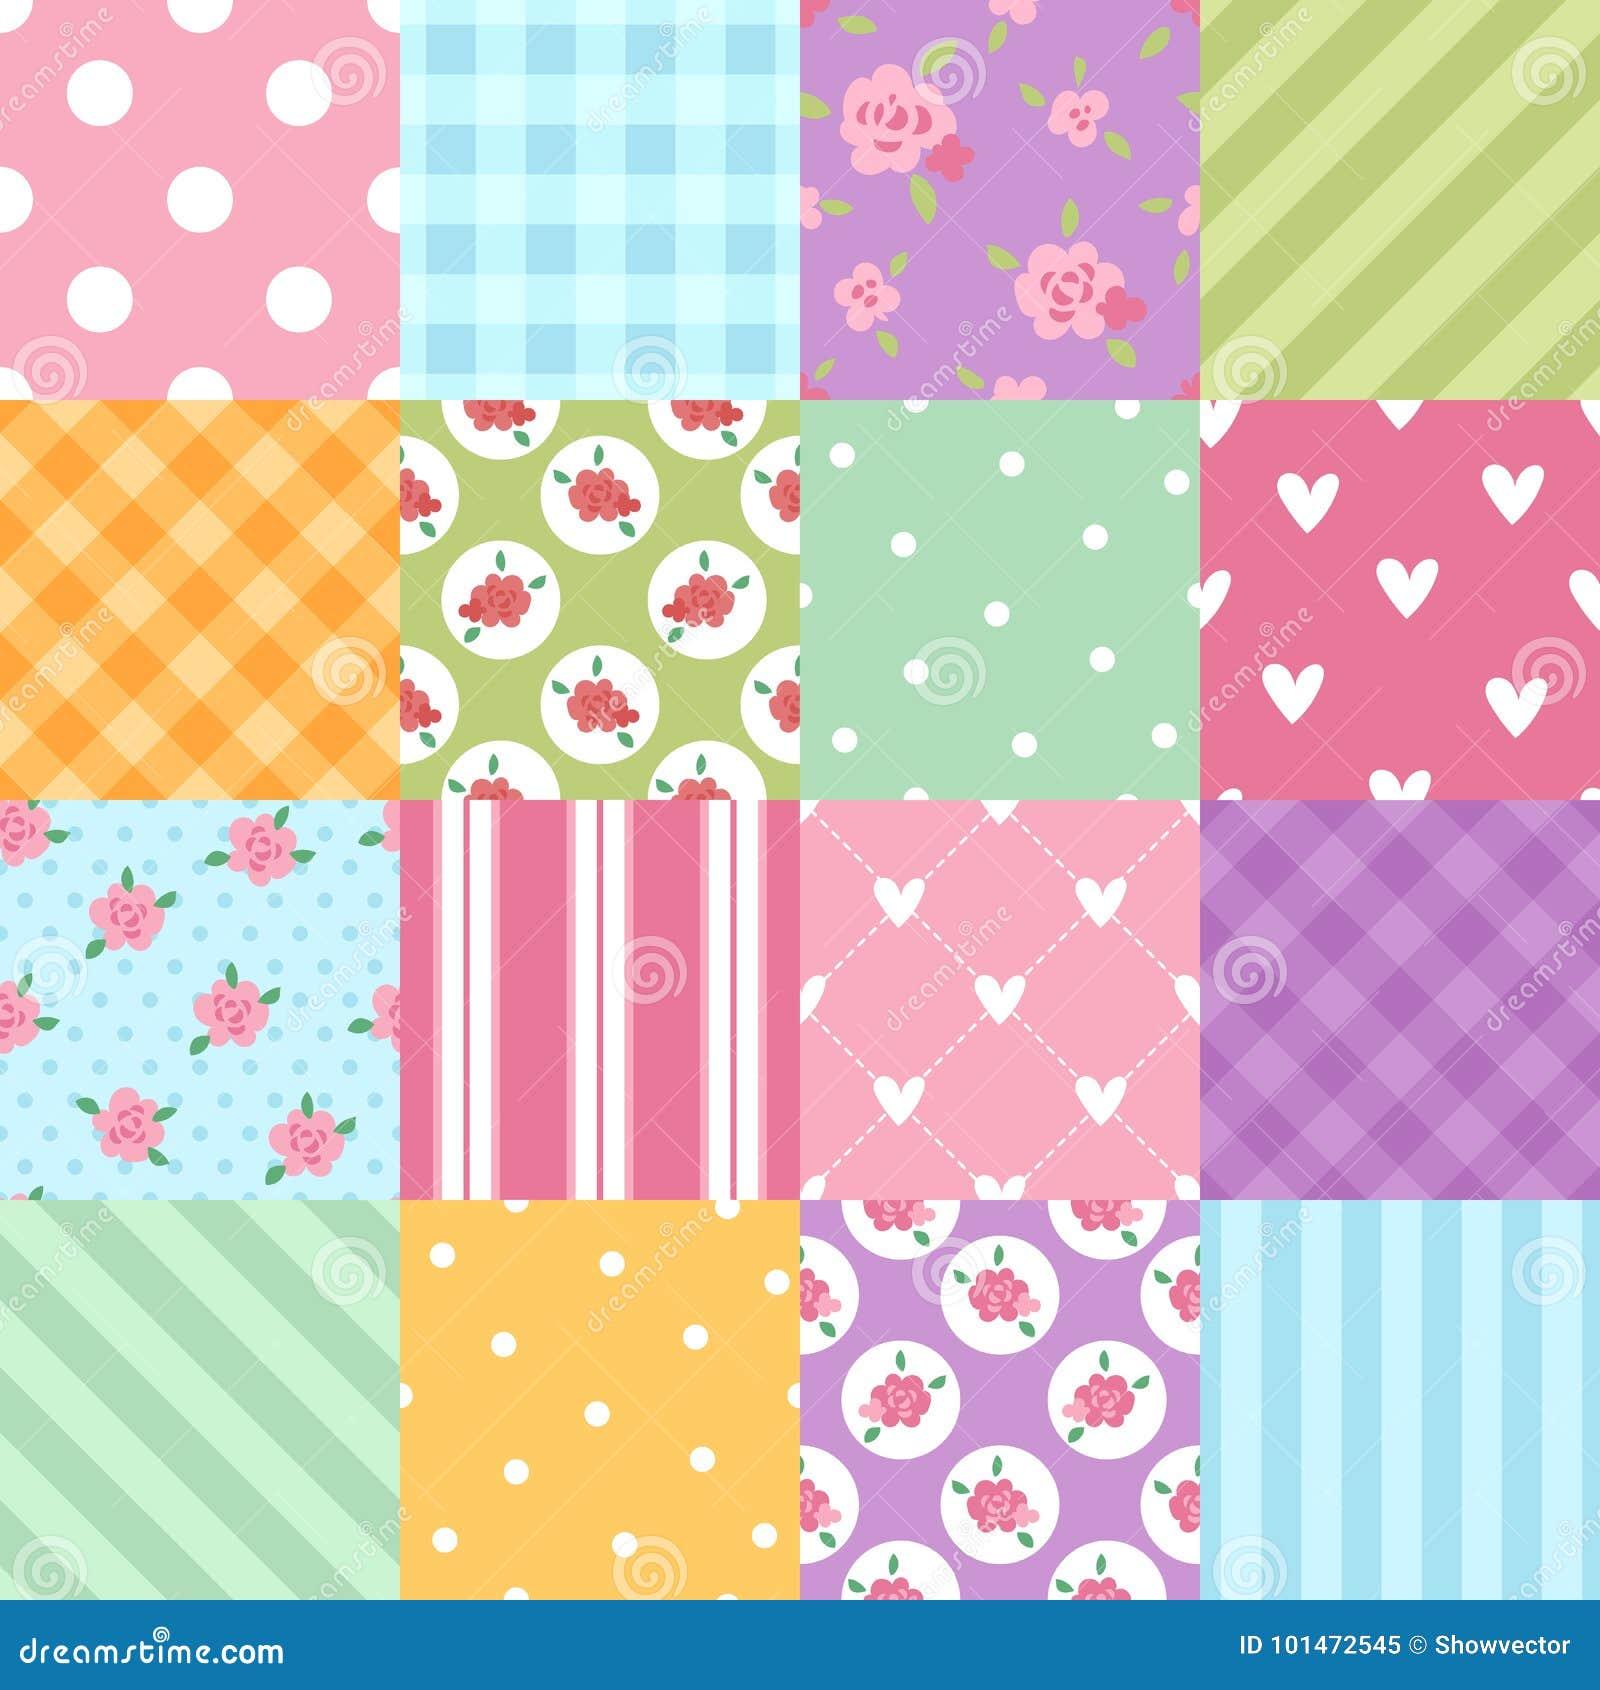 Patchwork textile texture seamless clothes pattern background tile decorative ornament design floral vector illustration